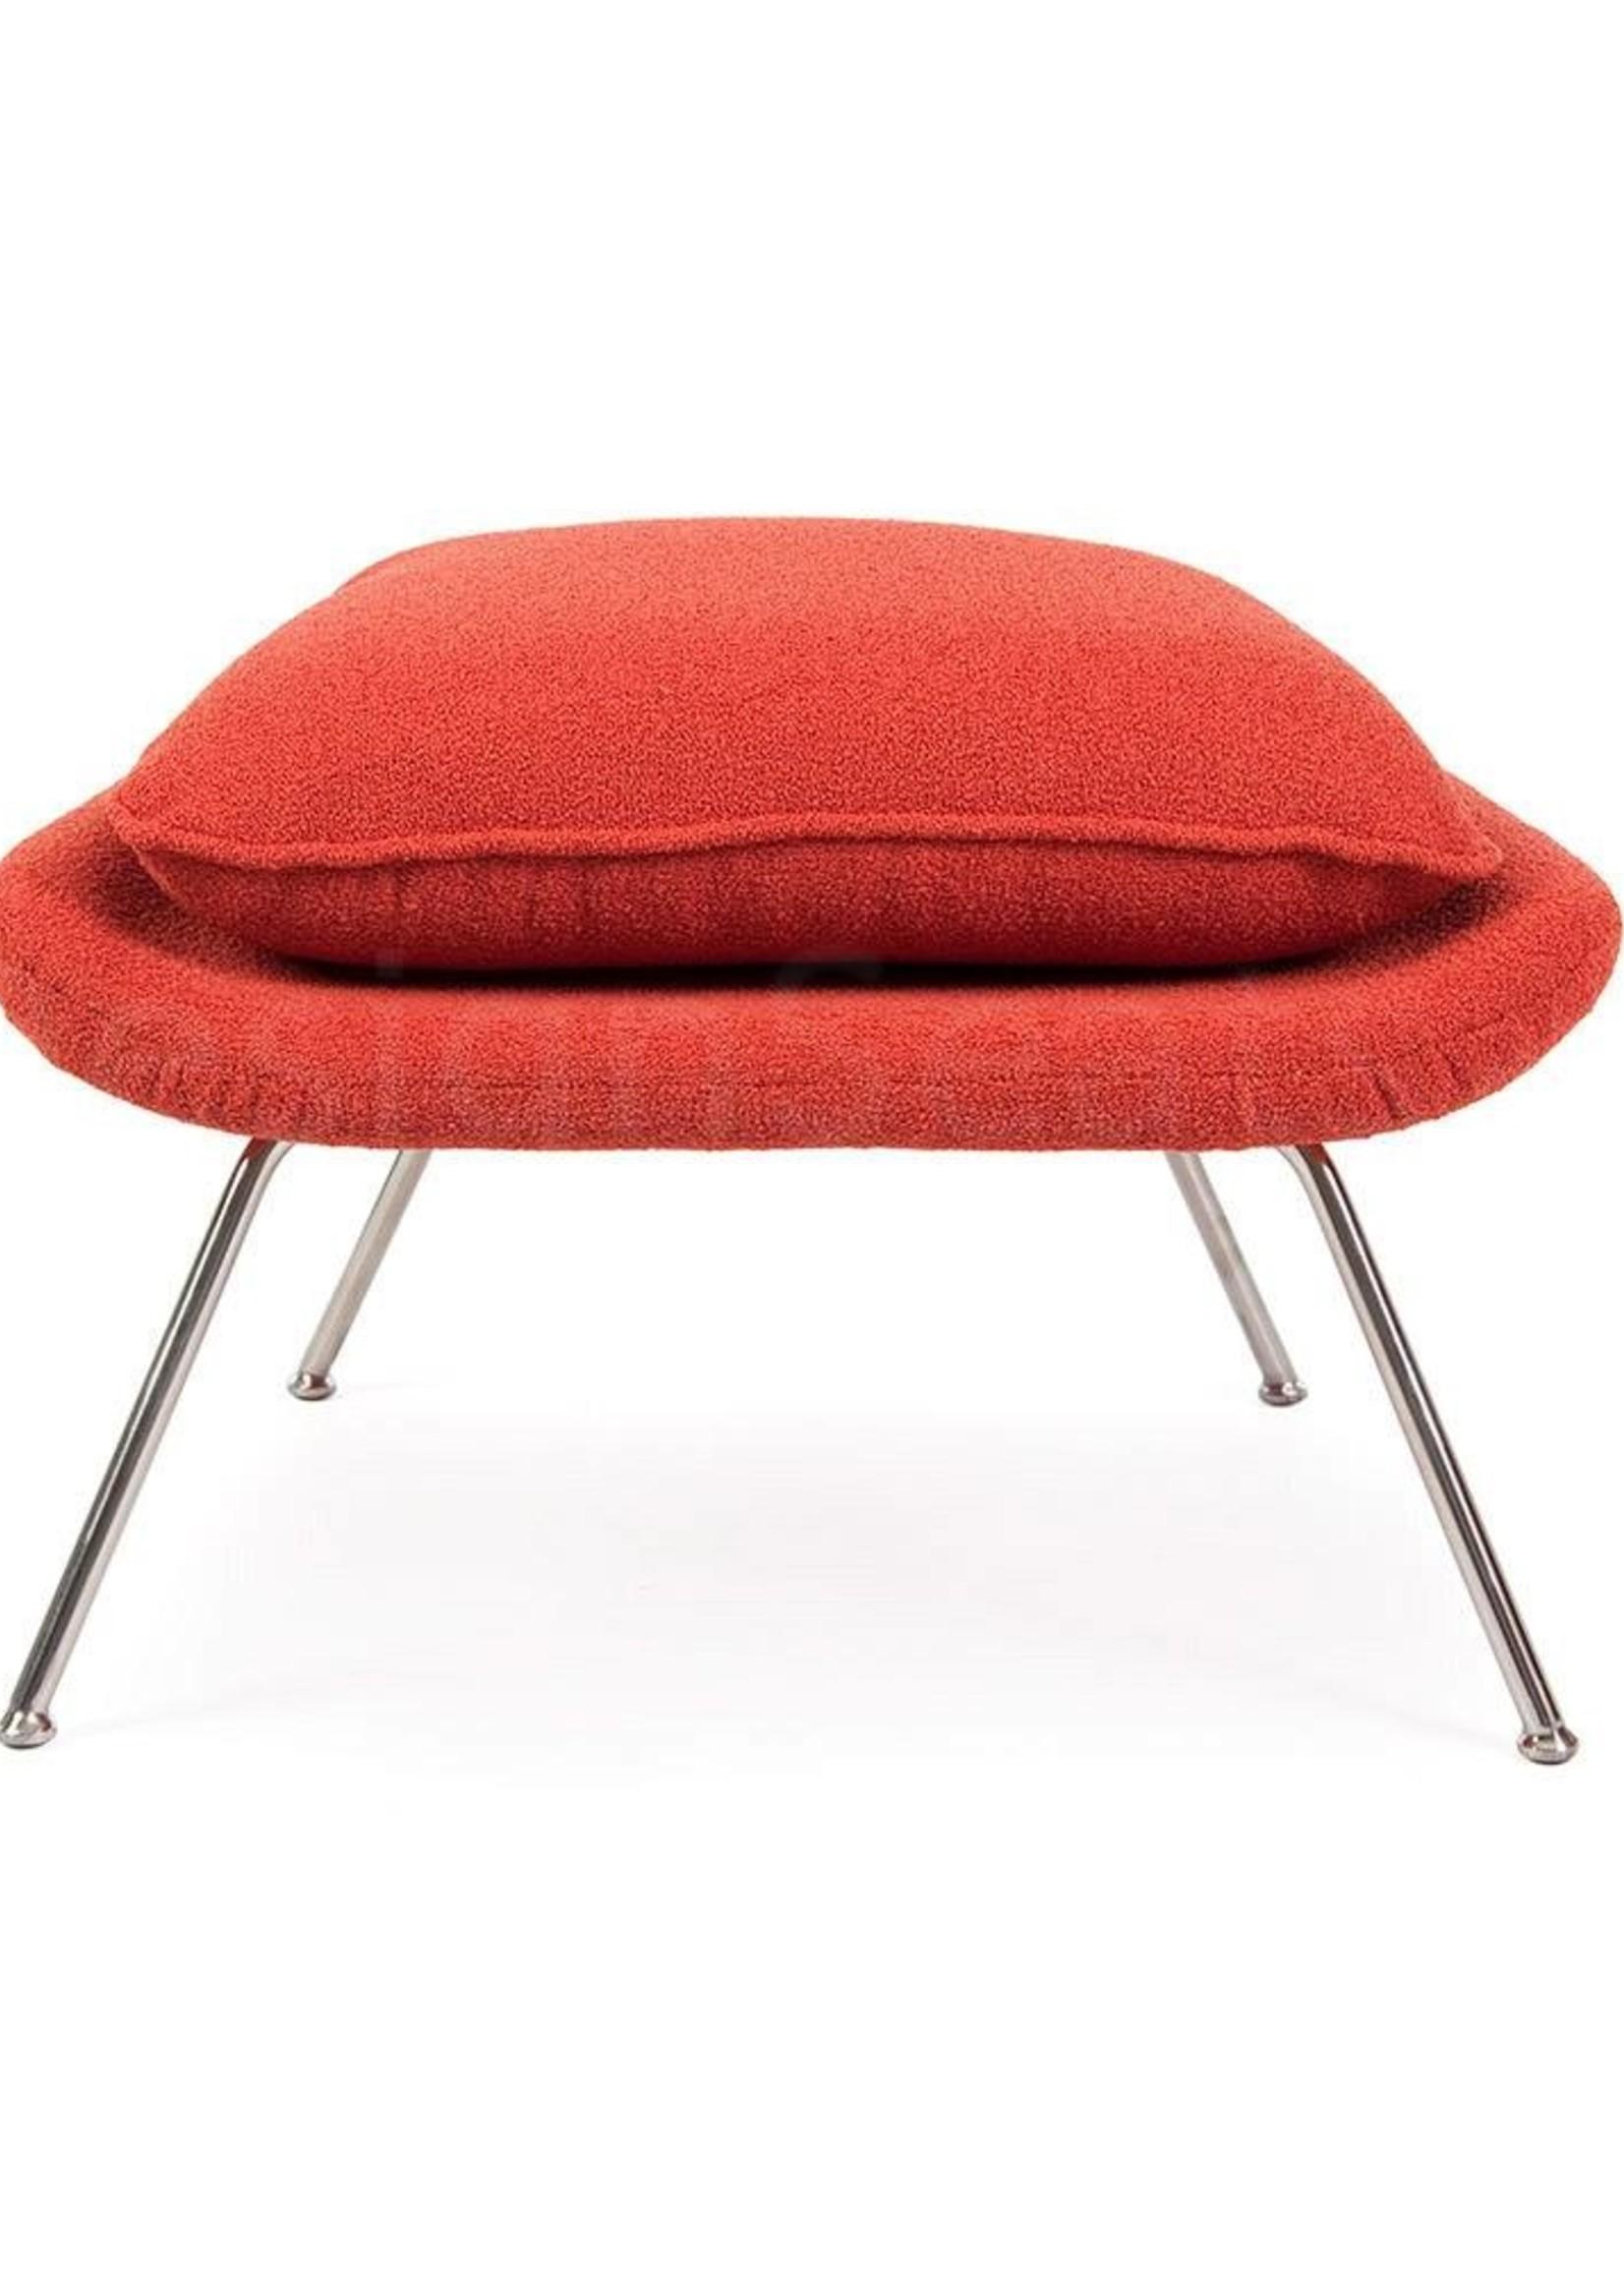 Womb chair Oranje